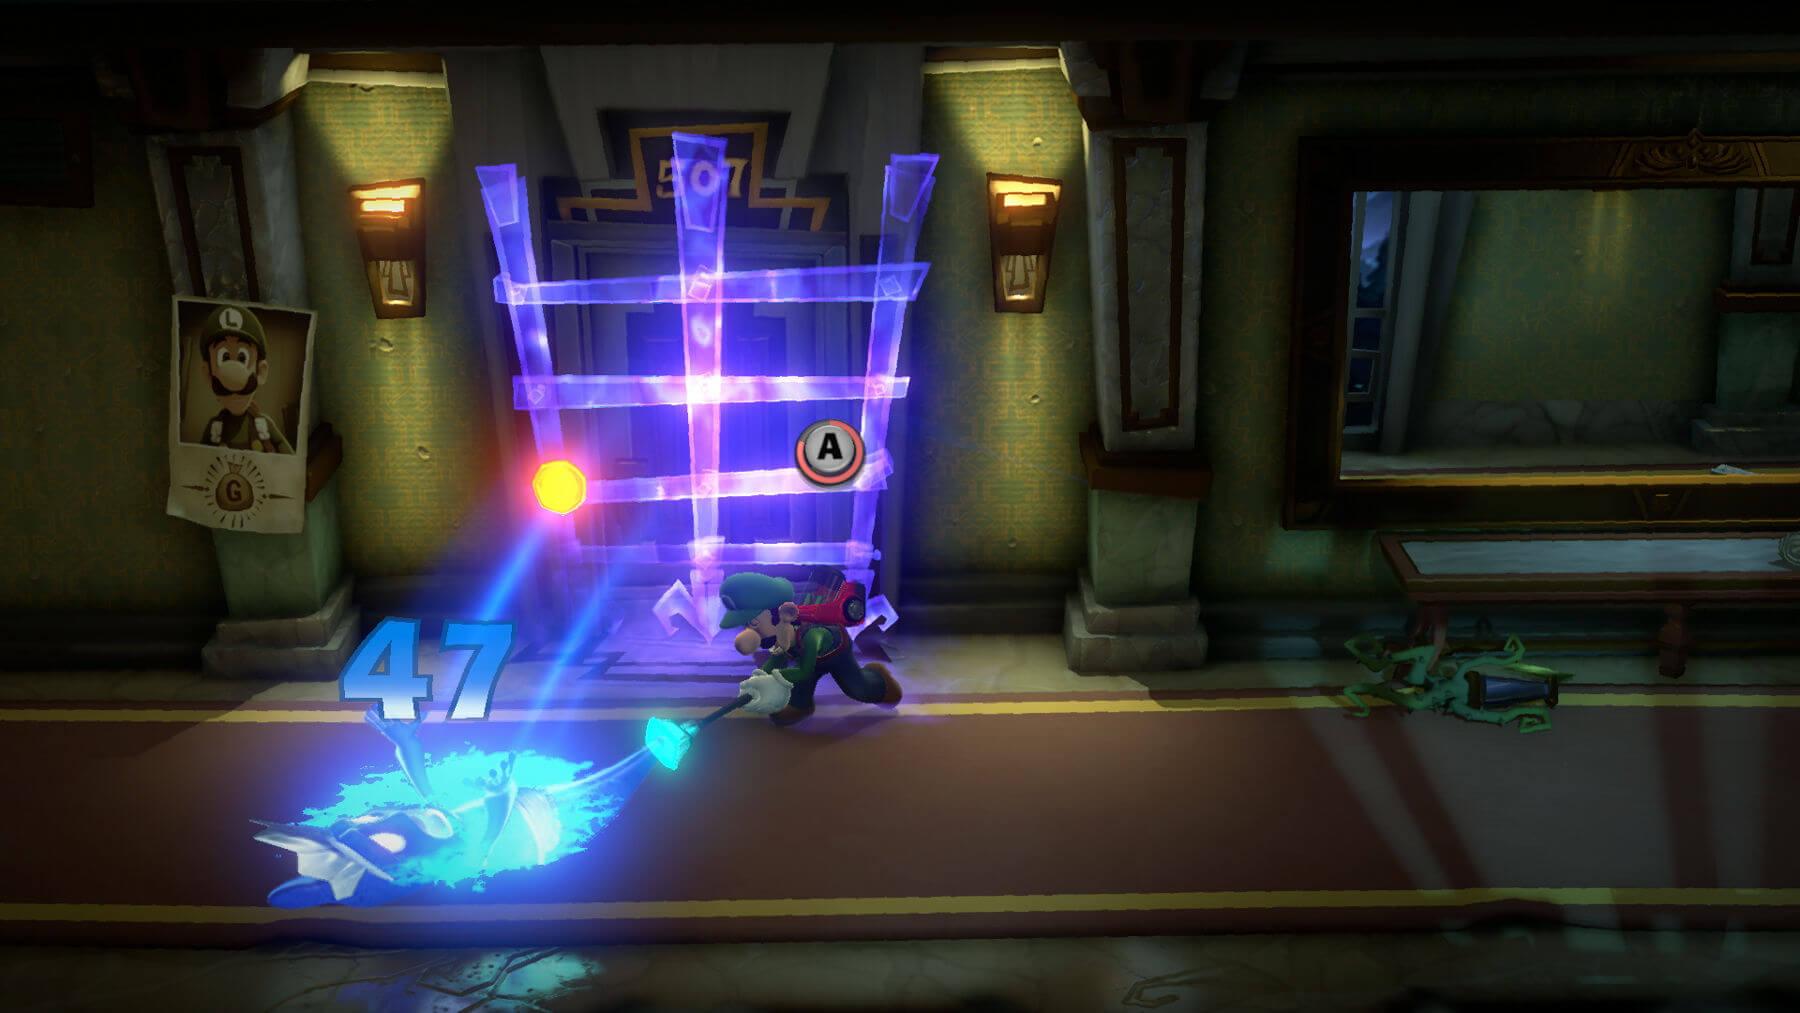 Luigi's Mansion 3 slam